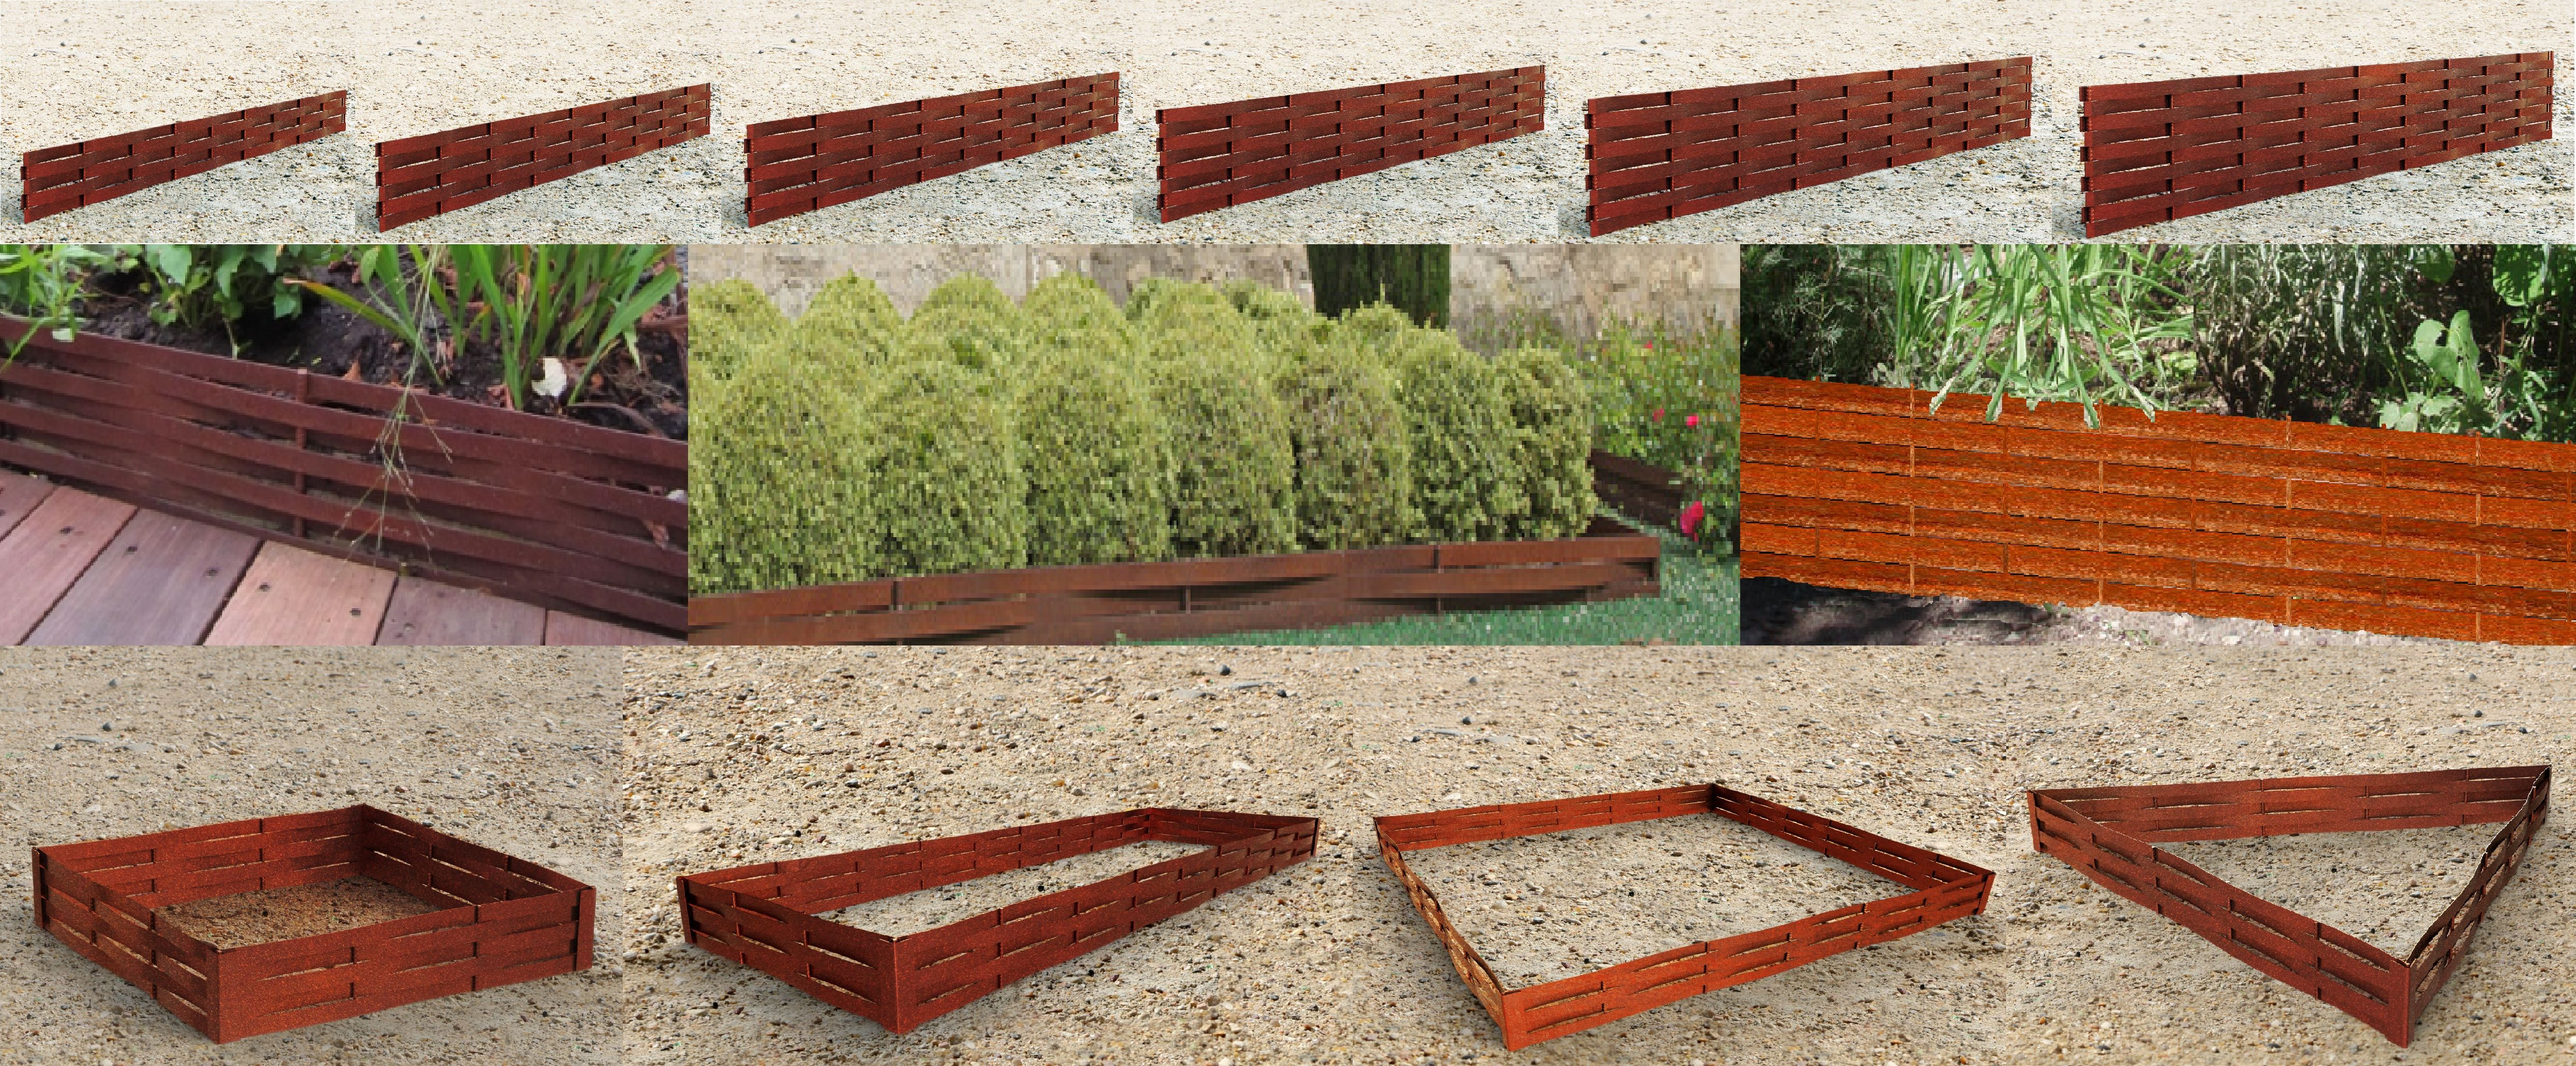 bordure jardin bordure de jardin en fer forg with bordure jardin gallery of clou duancrage. Black Bedroom Furniture Sets. Home Design Ideas